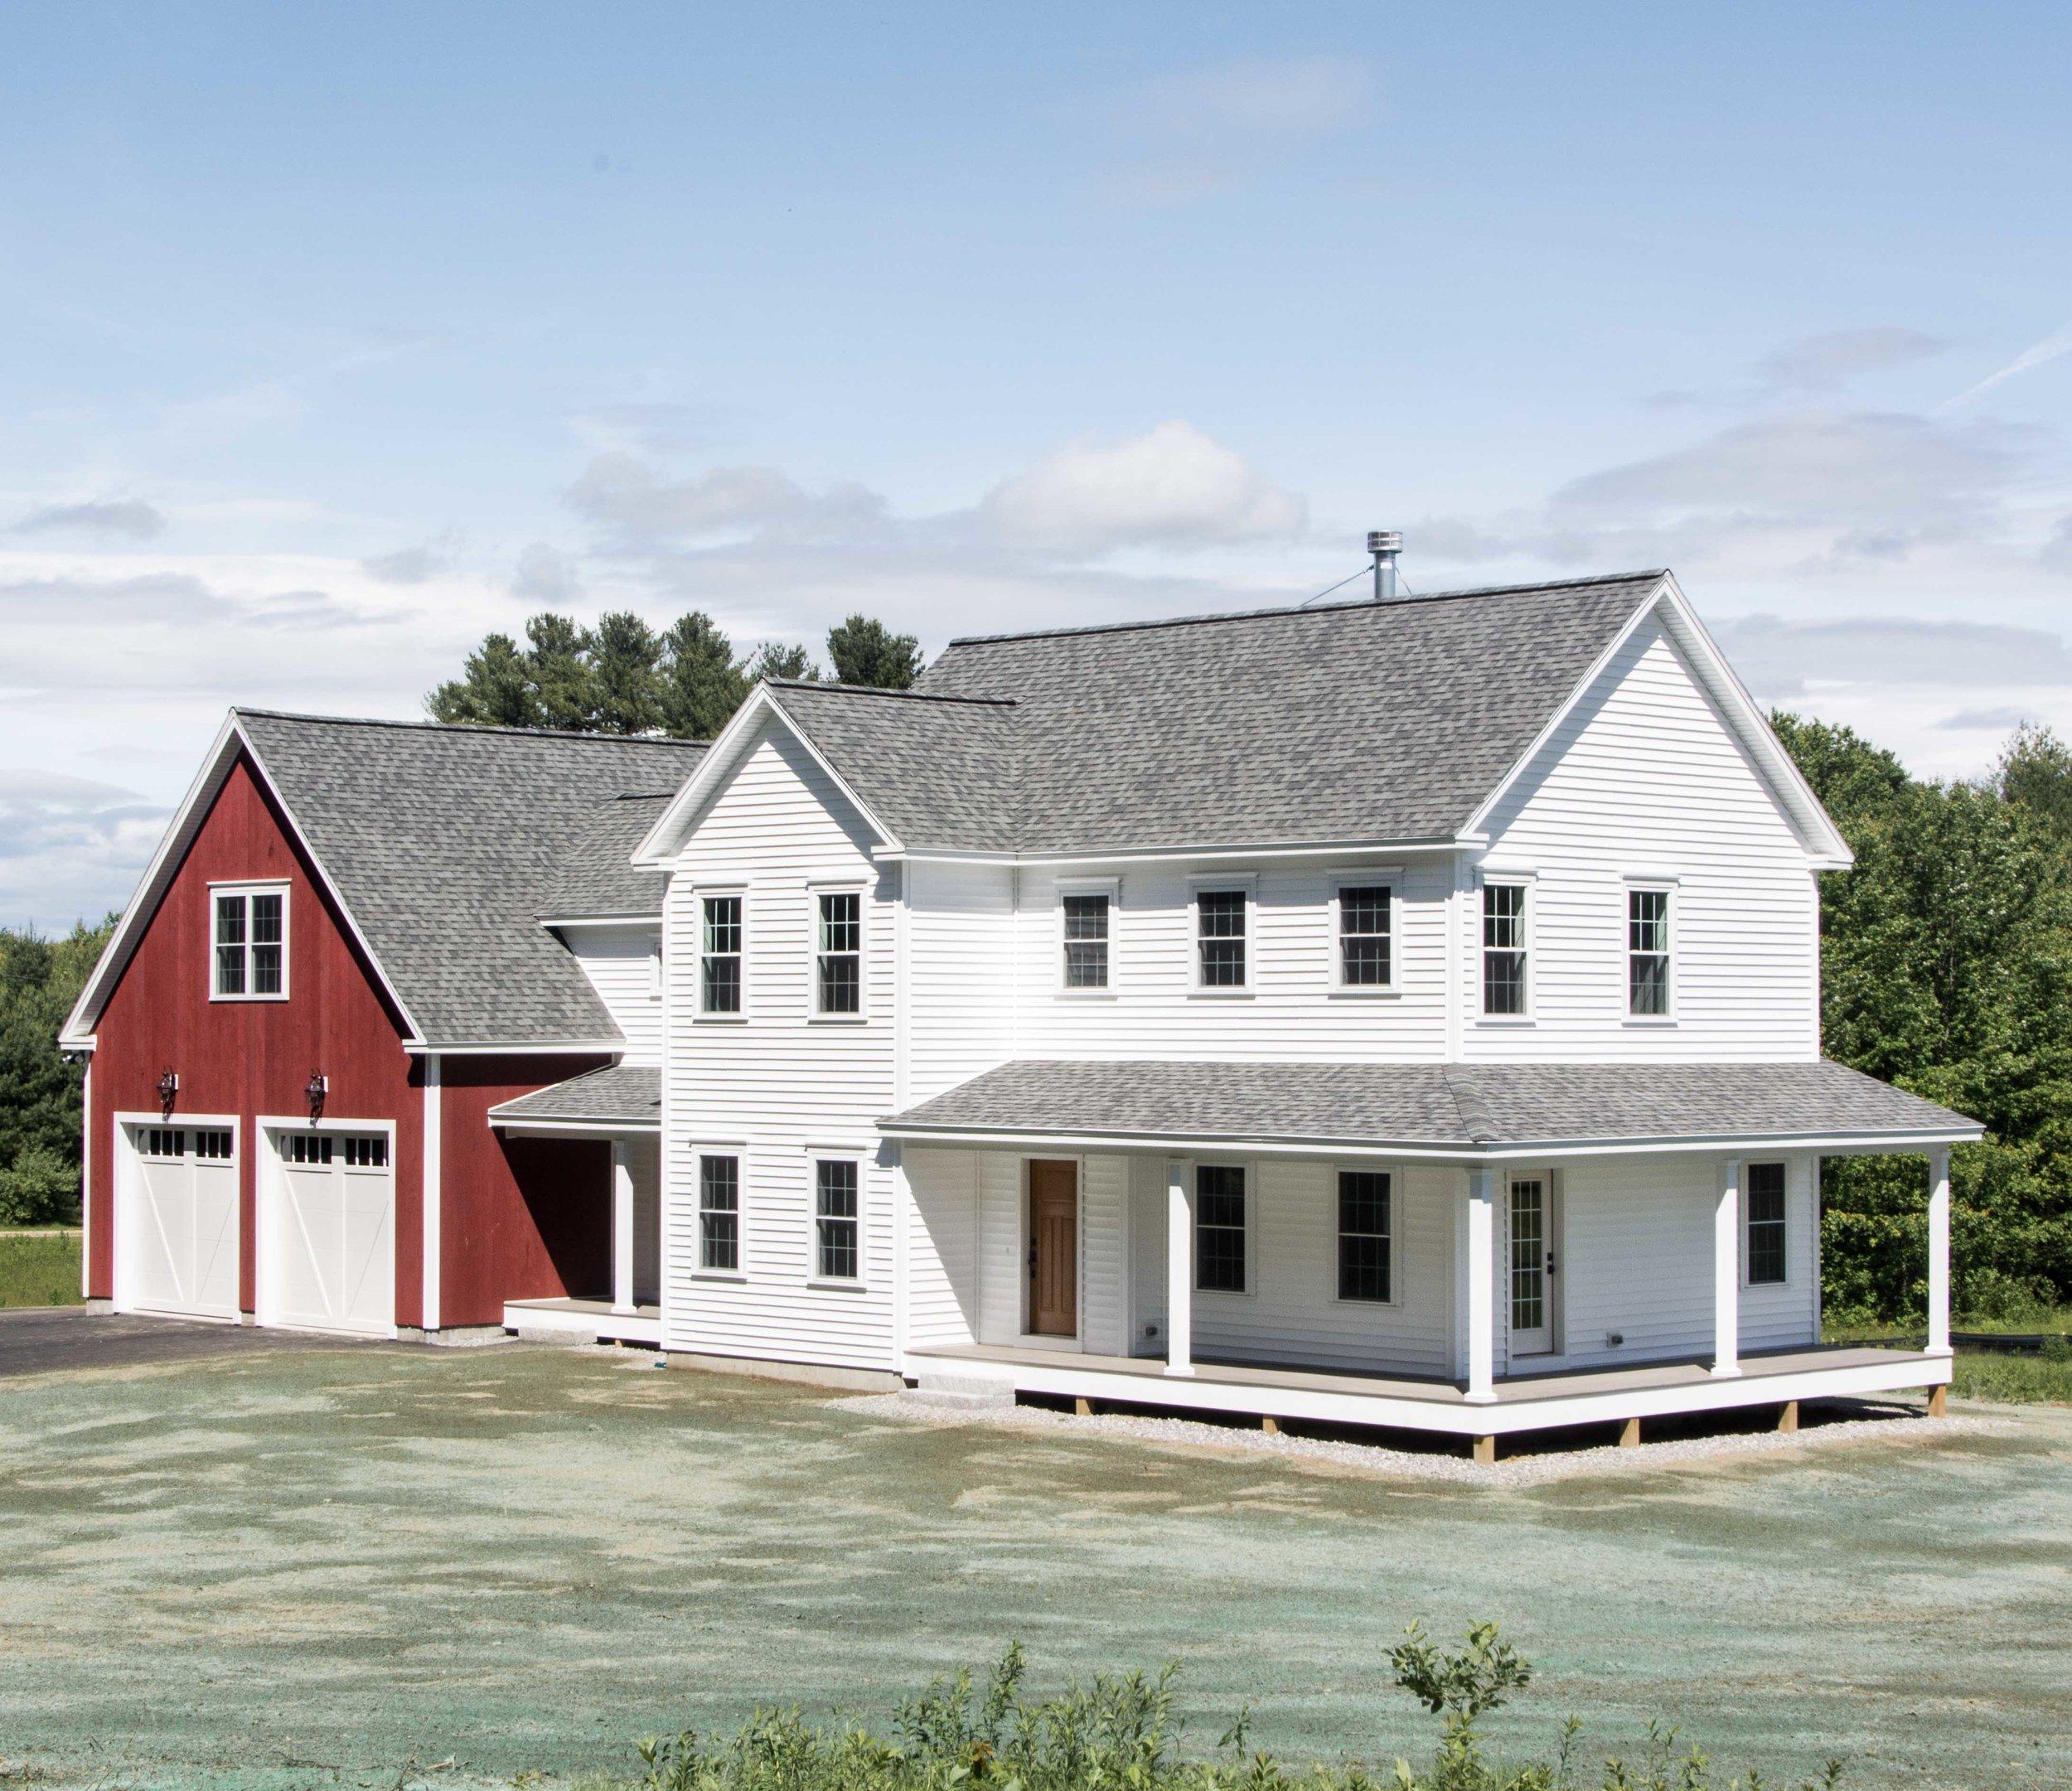 Pinewood Farmhouse, Gorham, Maine, Exterior